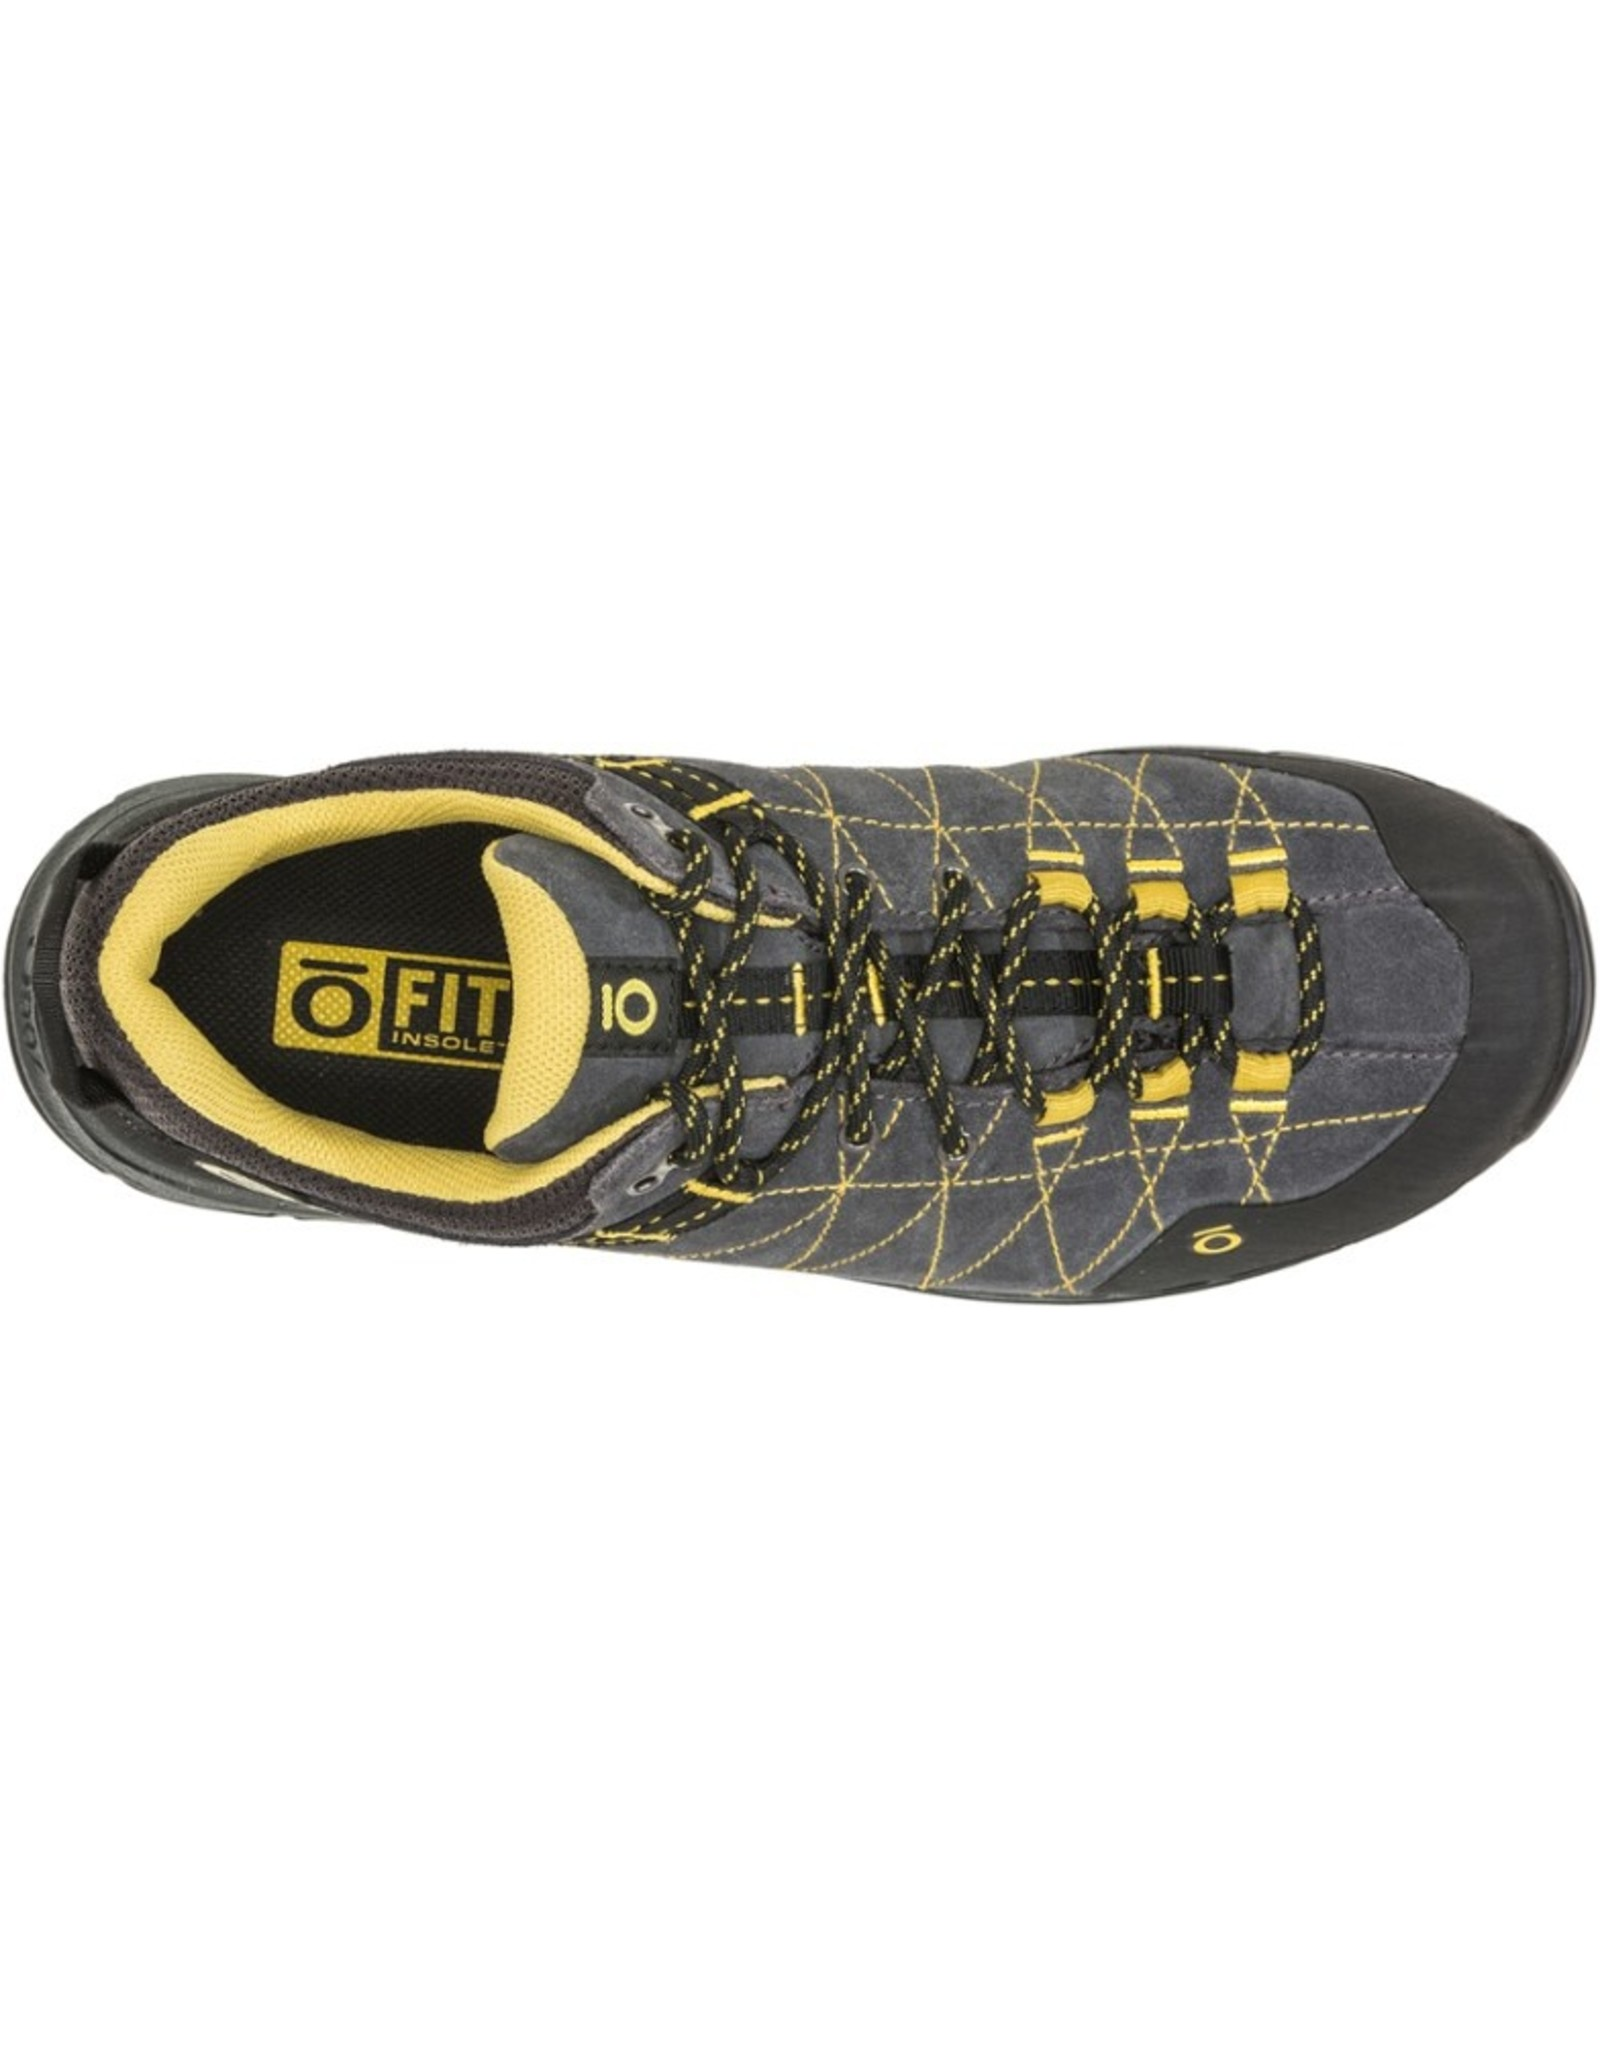 Oboz Oboz Men's Hyalite Low Shoe Dark Shadow / Lichen 8.5